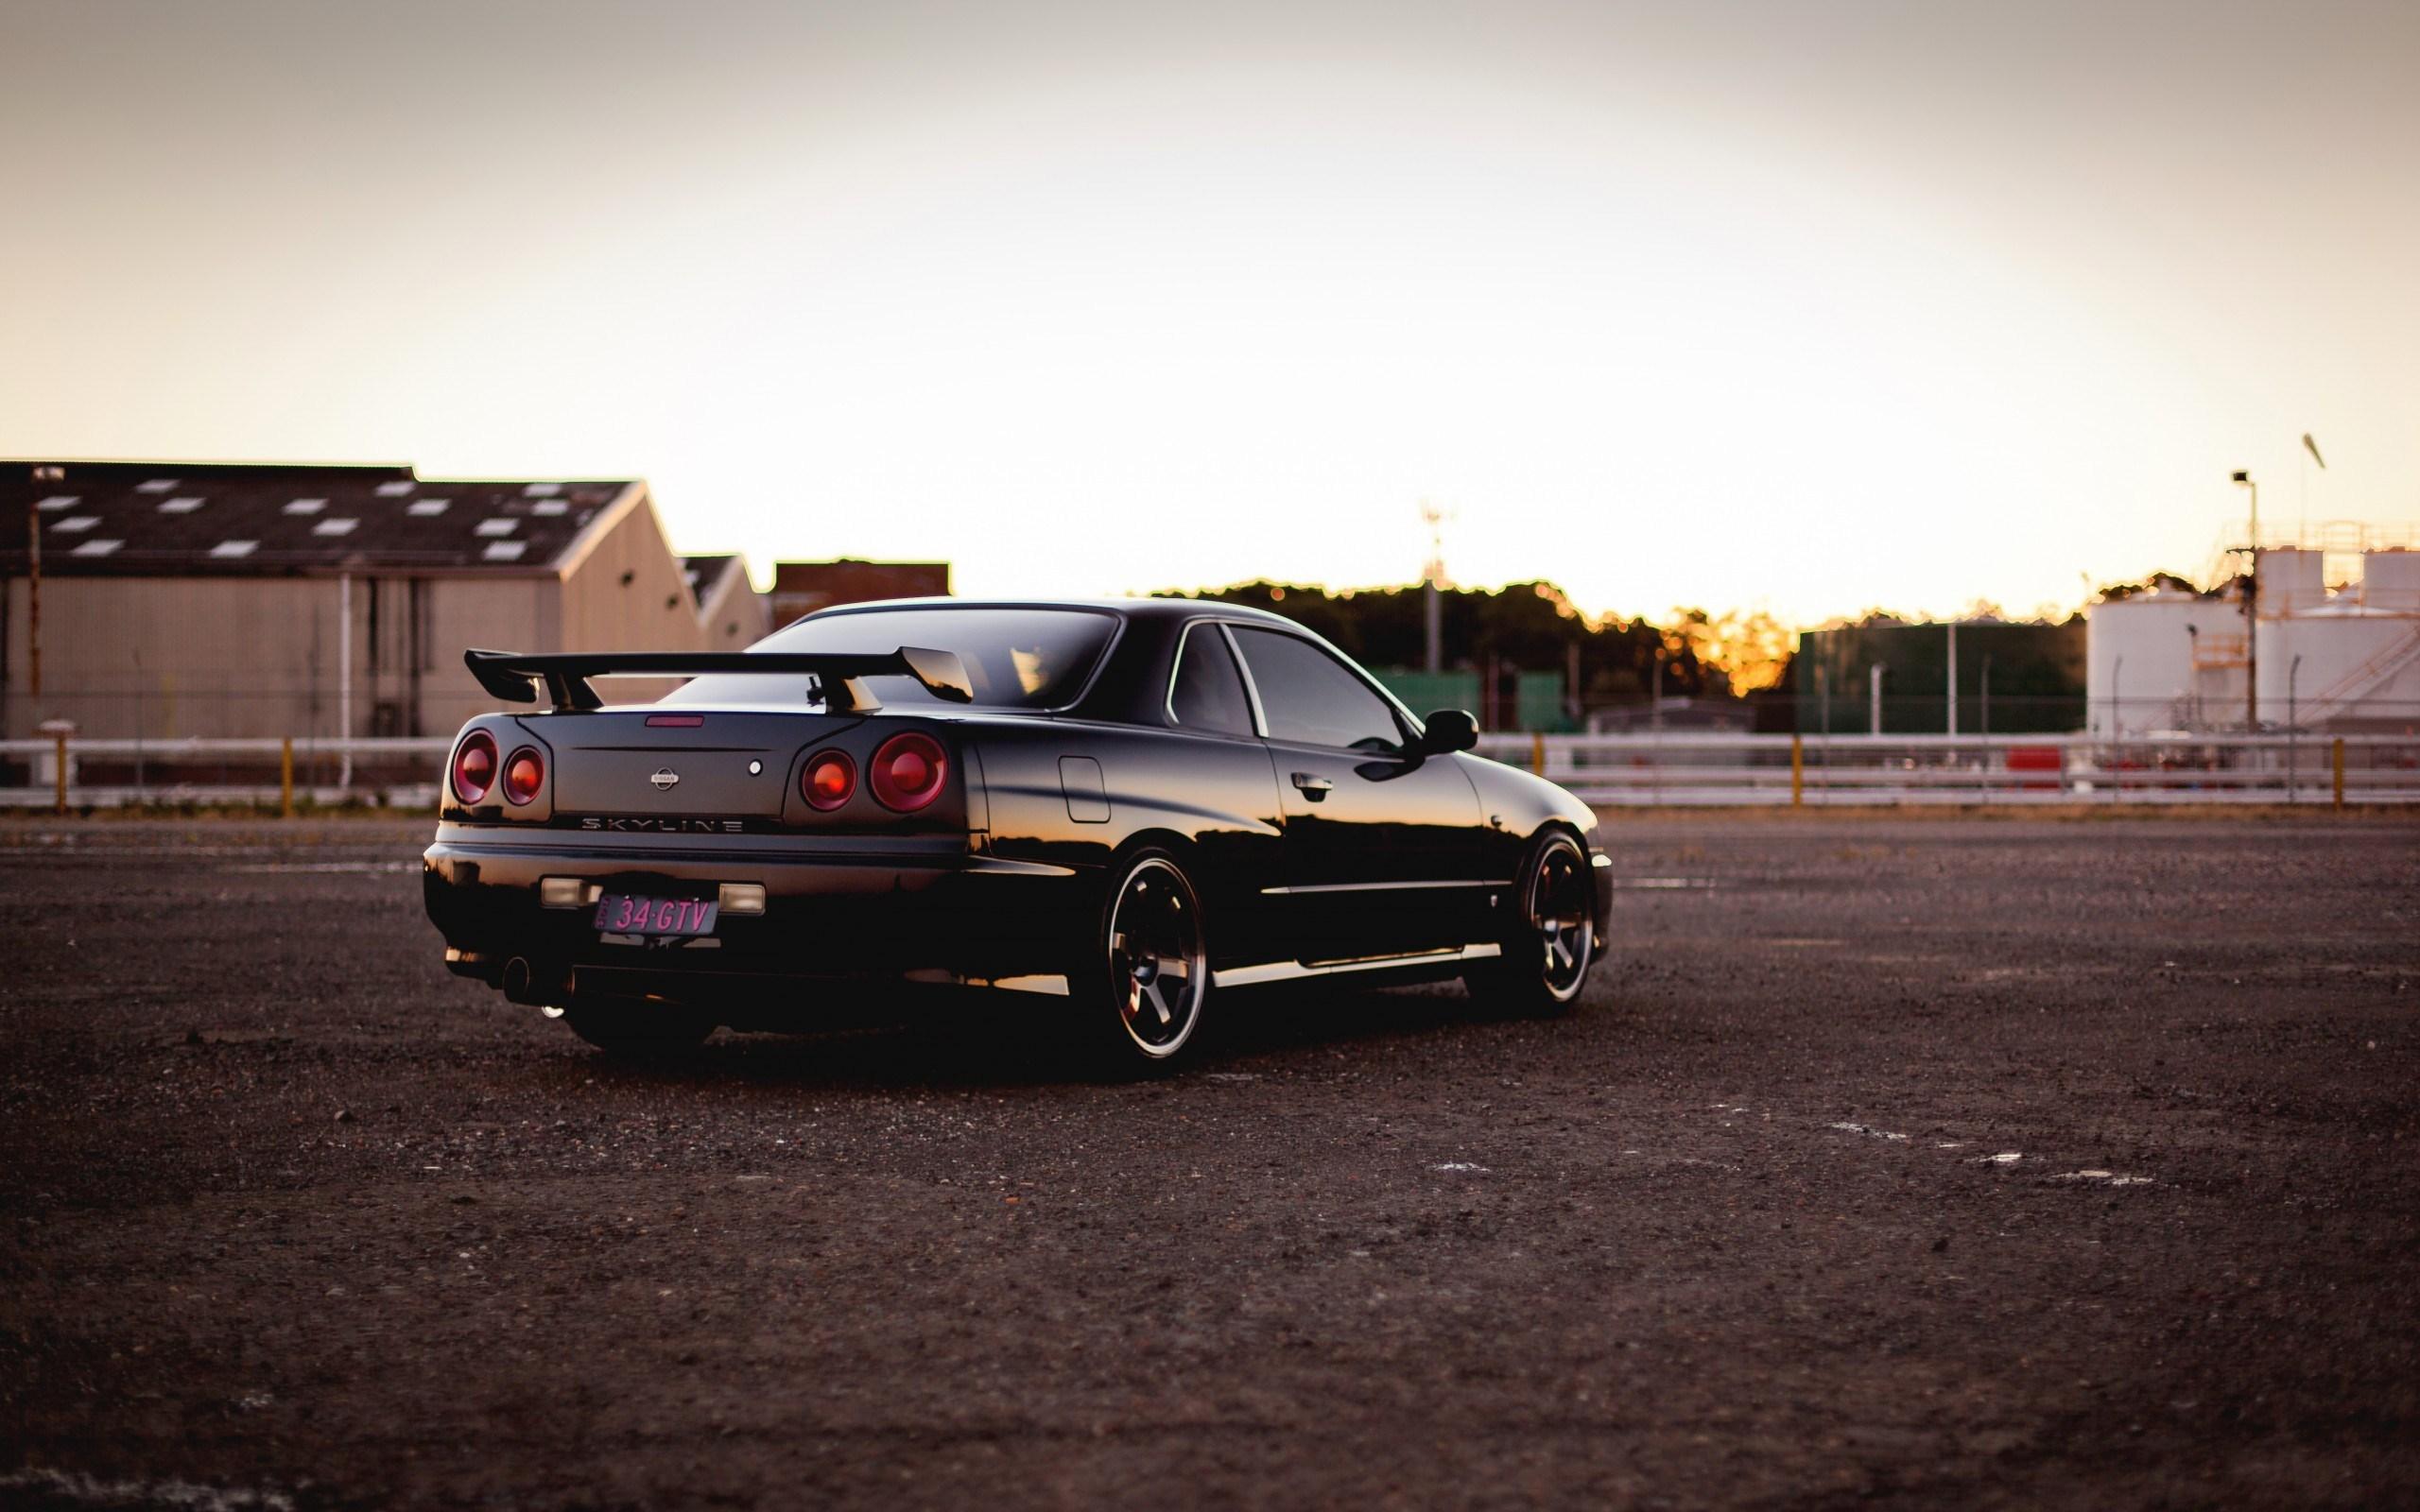 Skyline Nissan Wallpaper Black 2560x1600 Wallpaper Teahub Io